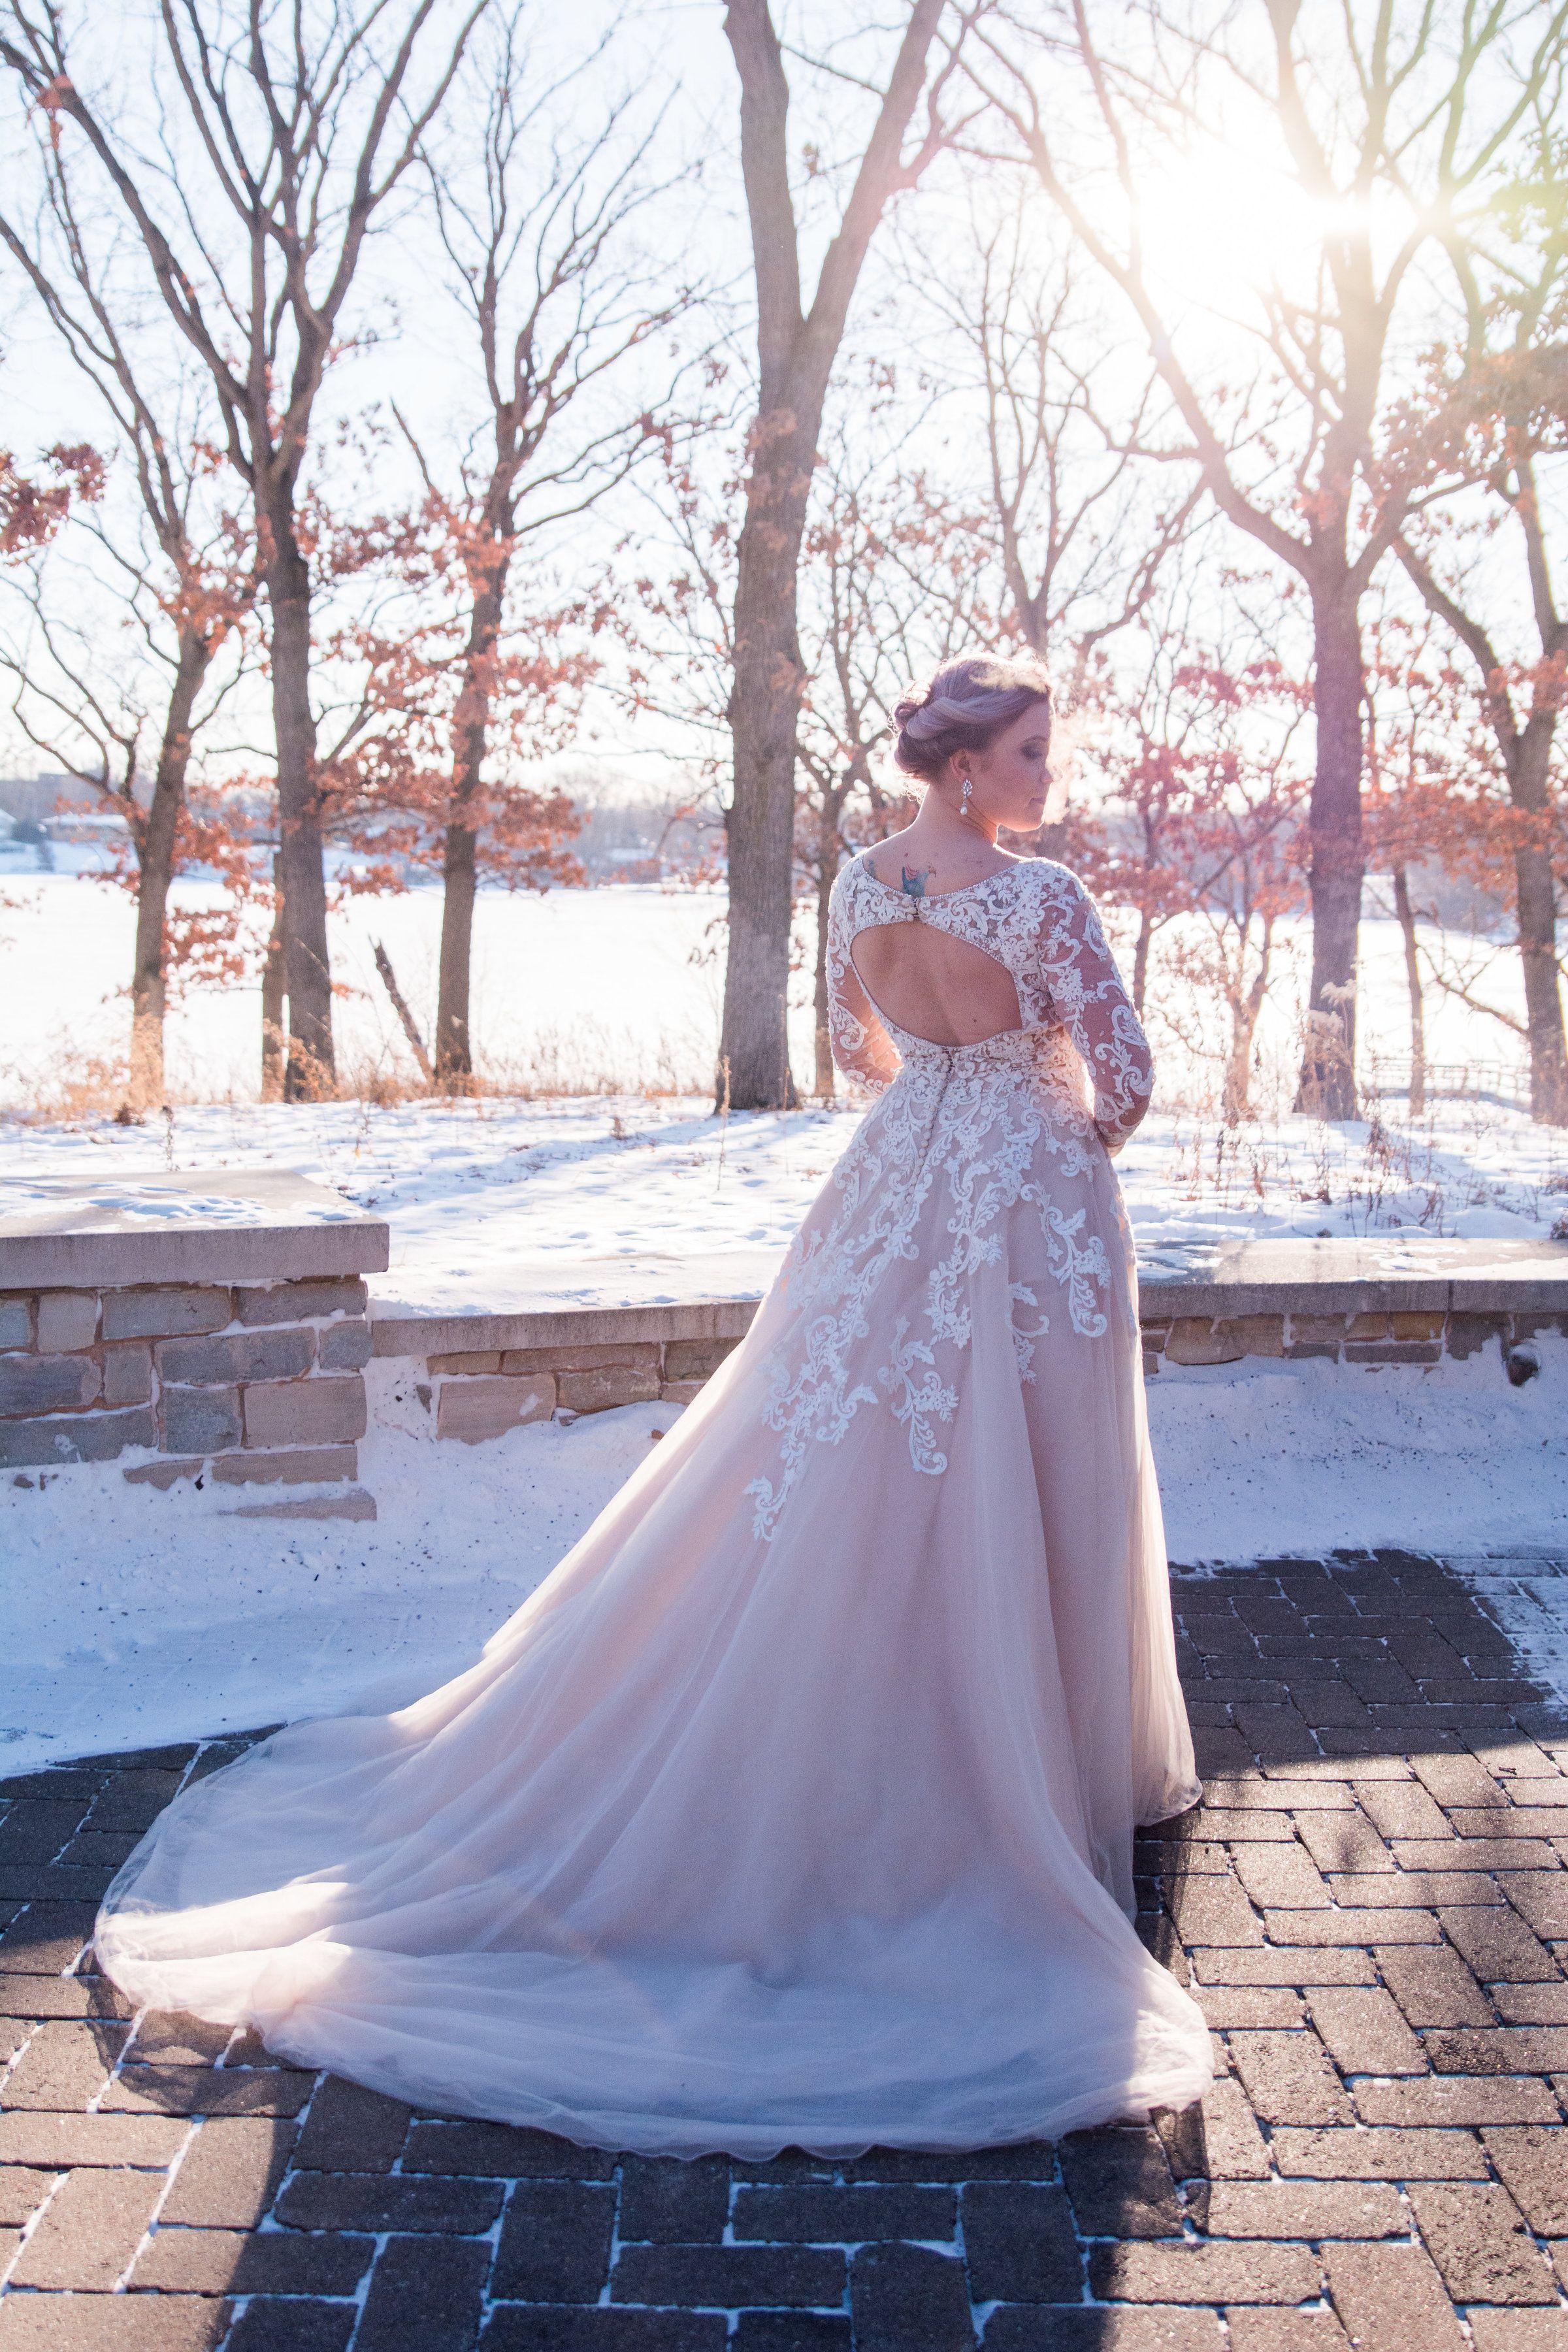 1d92819ca46dd Venue: 3 Rivers Park District - Silverwood Park, St. Anthony, MN, long  sleeve wedding dress, lace wedding dress   Mori Lee Maira   Wedding Shoppe,  Inc.